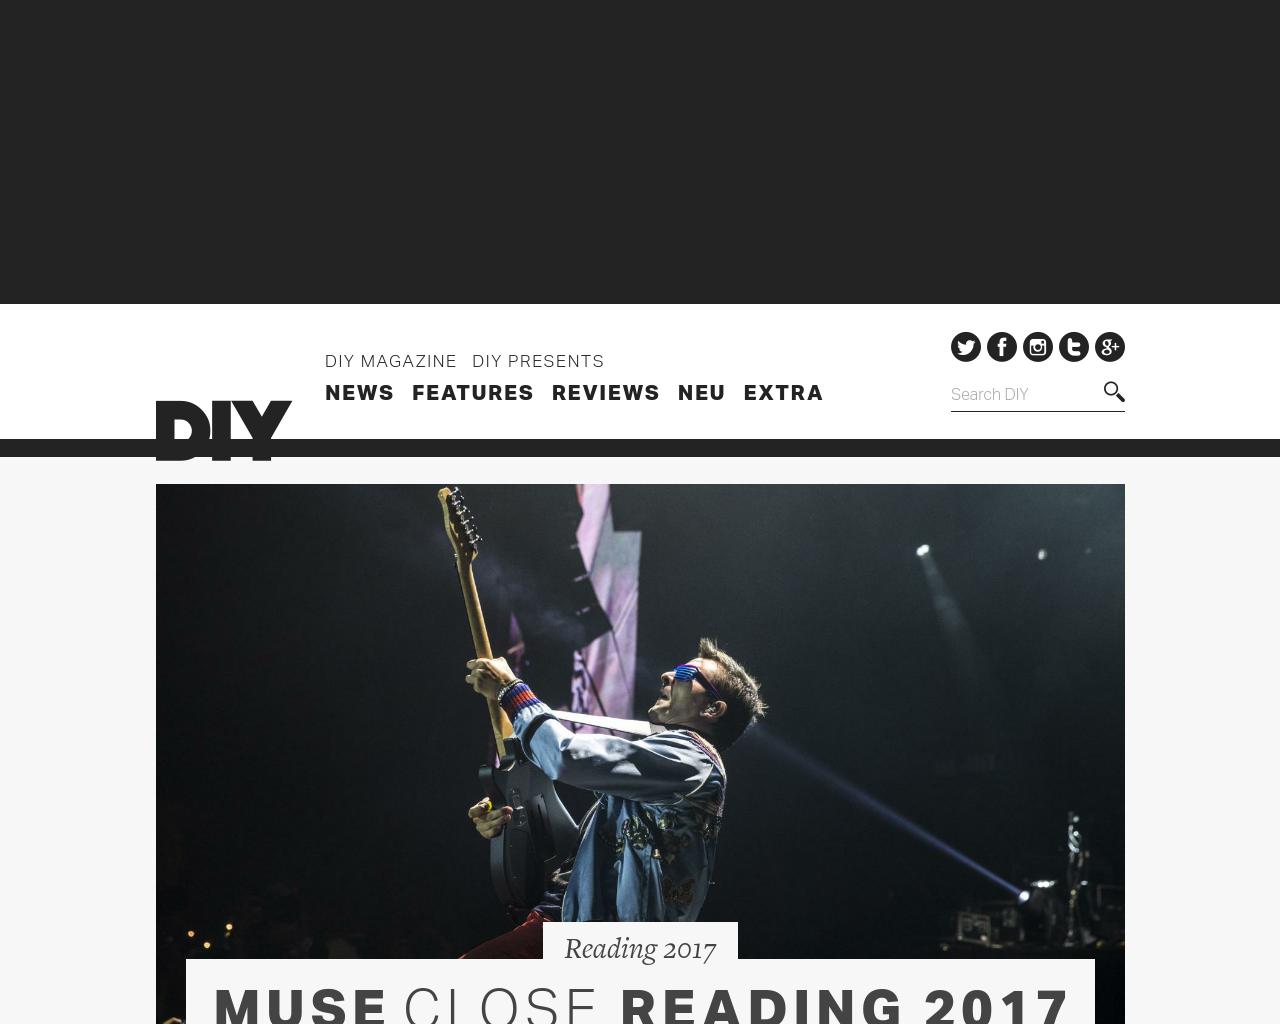 Diymag.com-Advertising-Reviews-Pricing